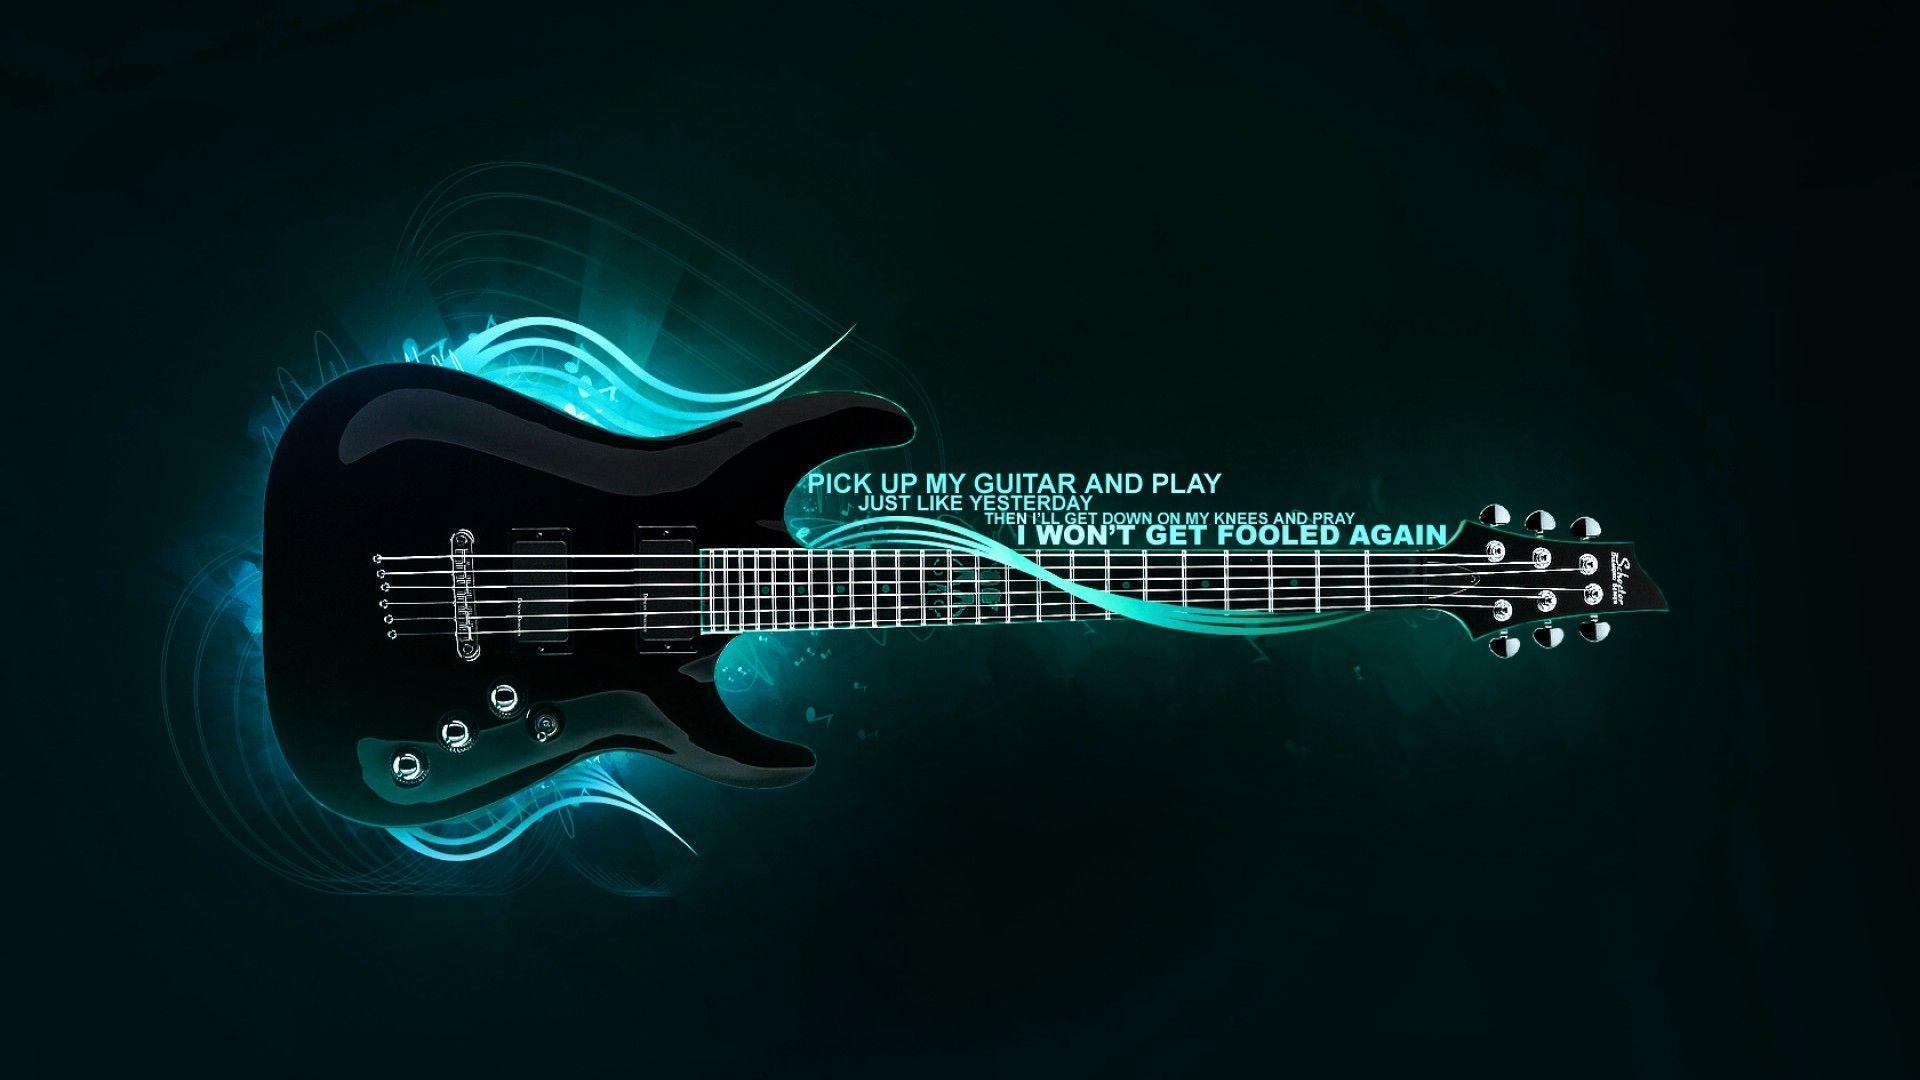 Guitar Image Hd Hd Background Wallpaper 41 HD Wallpapers | www ...